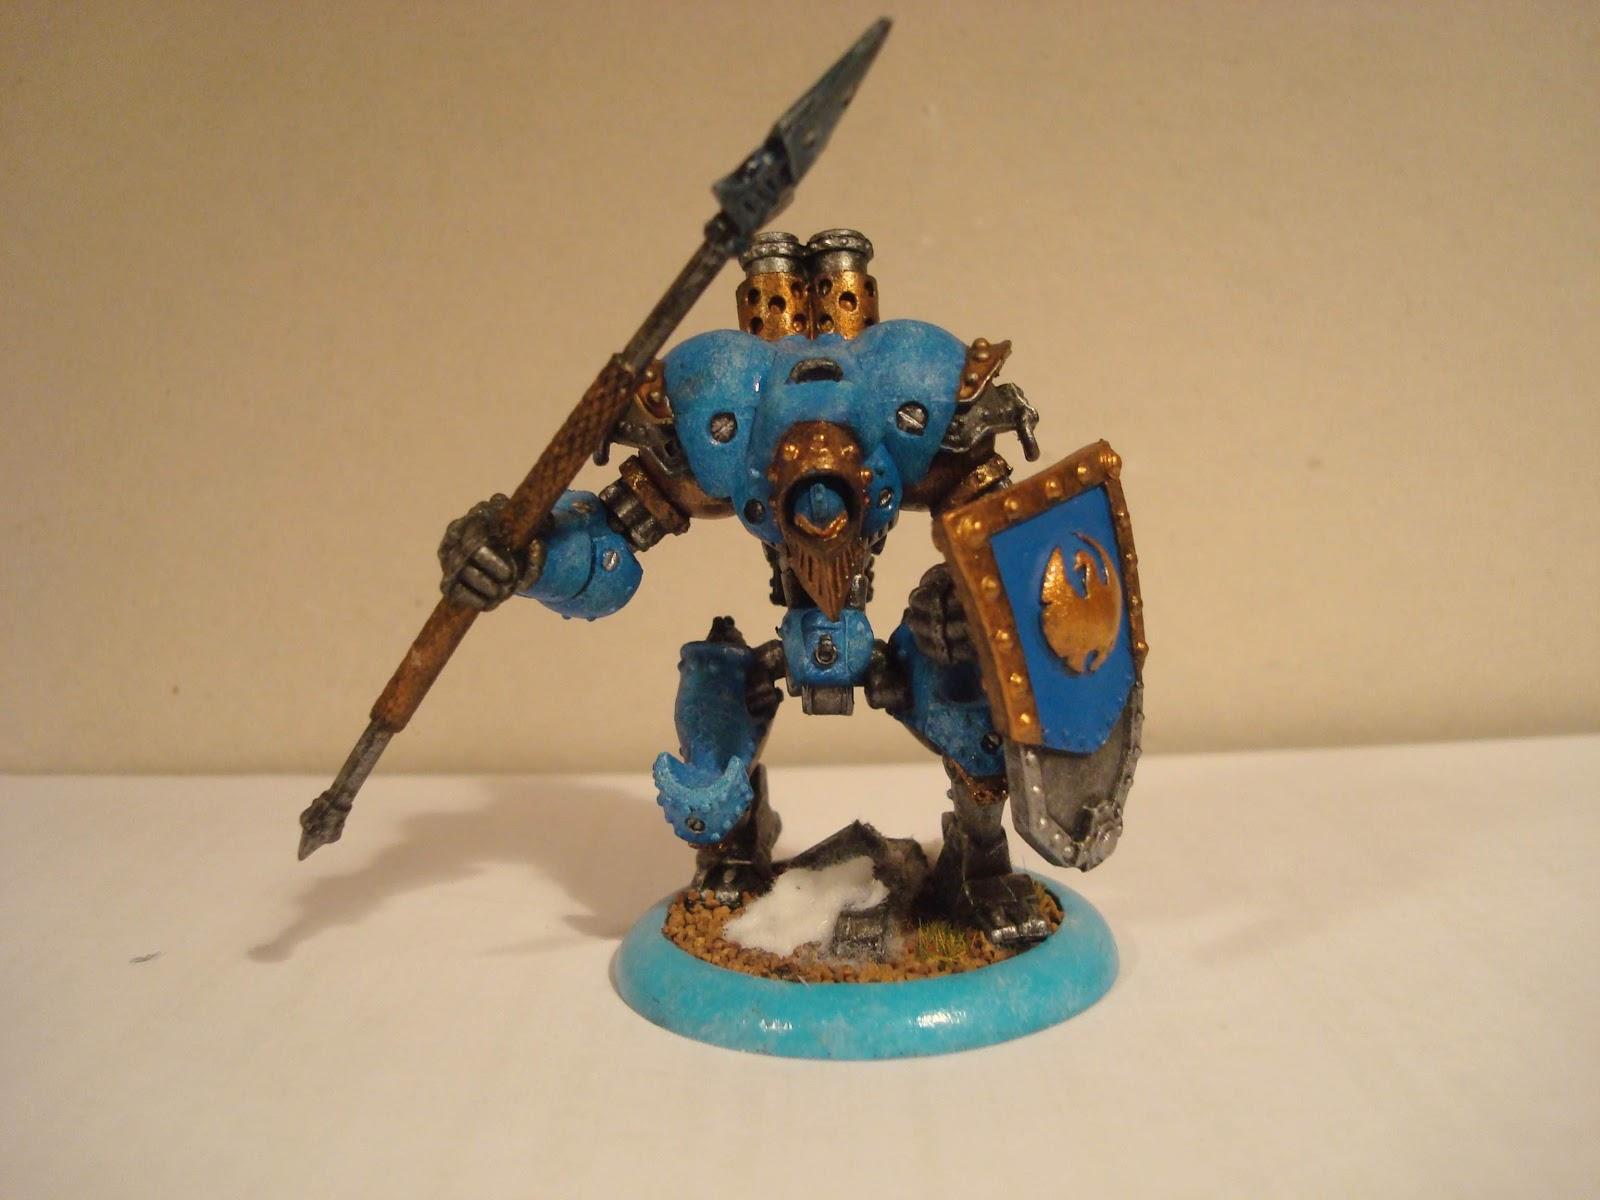 Iron Braxus Warmachine Cygnar Approaches